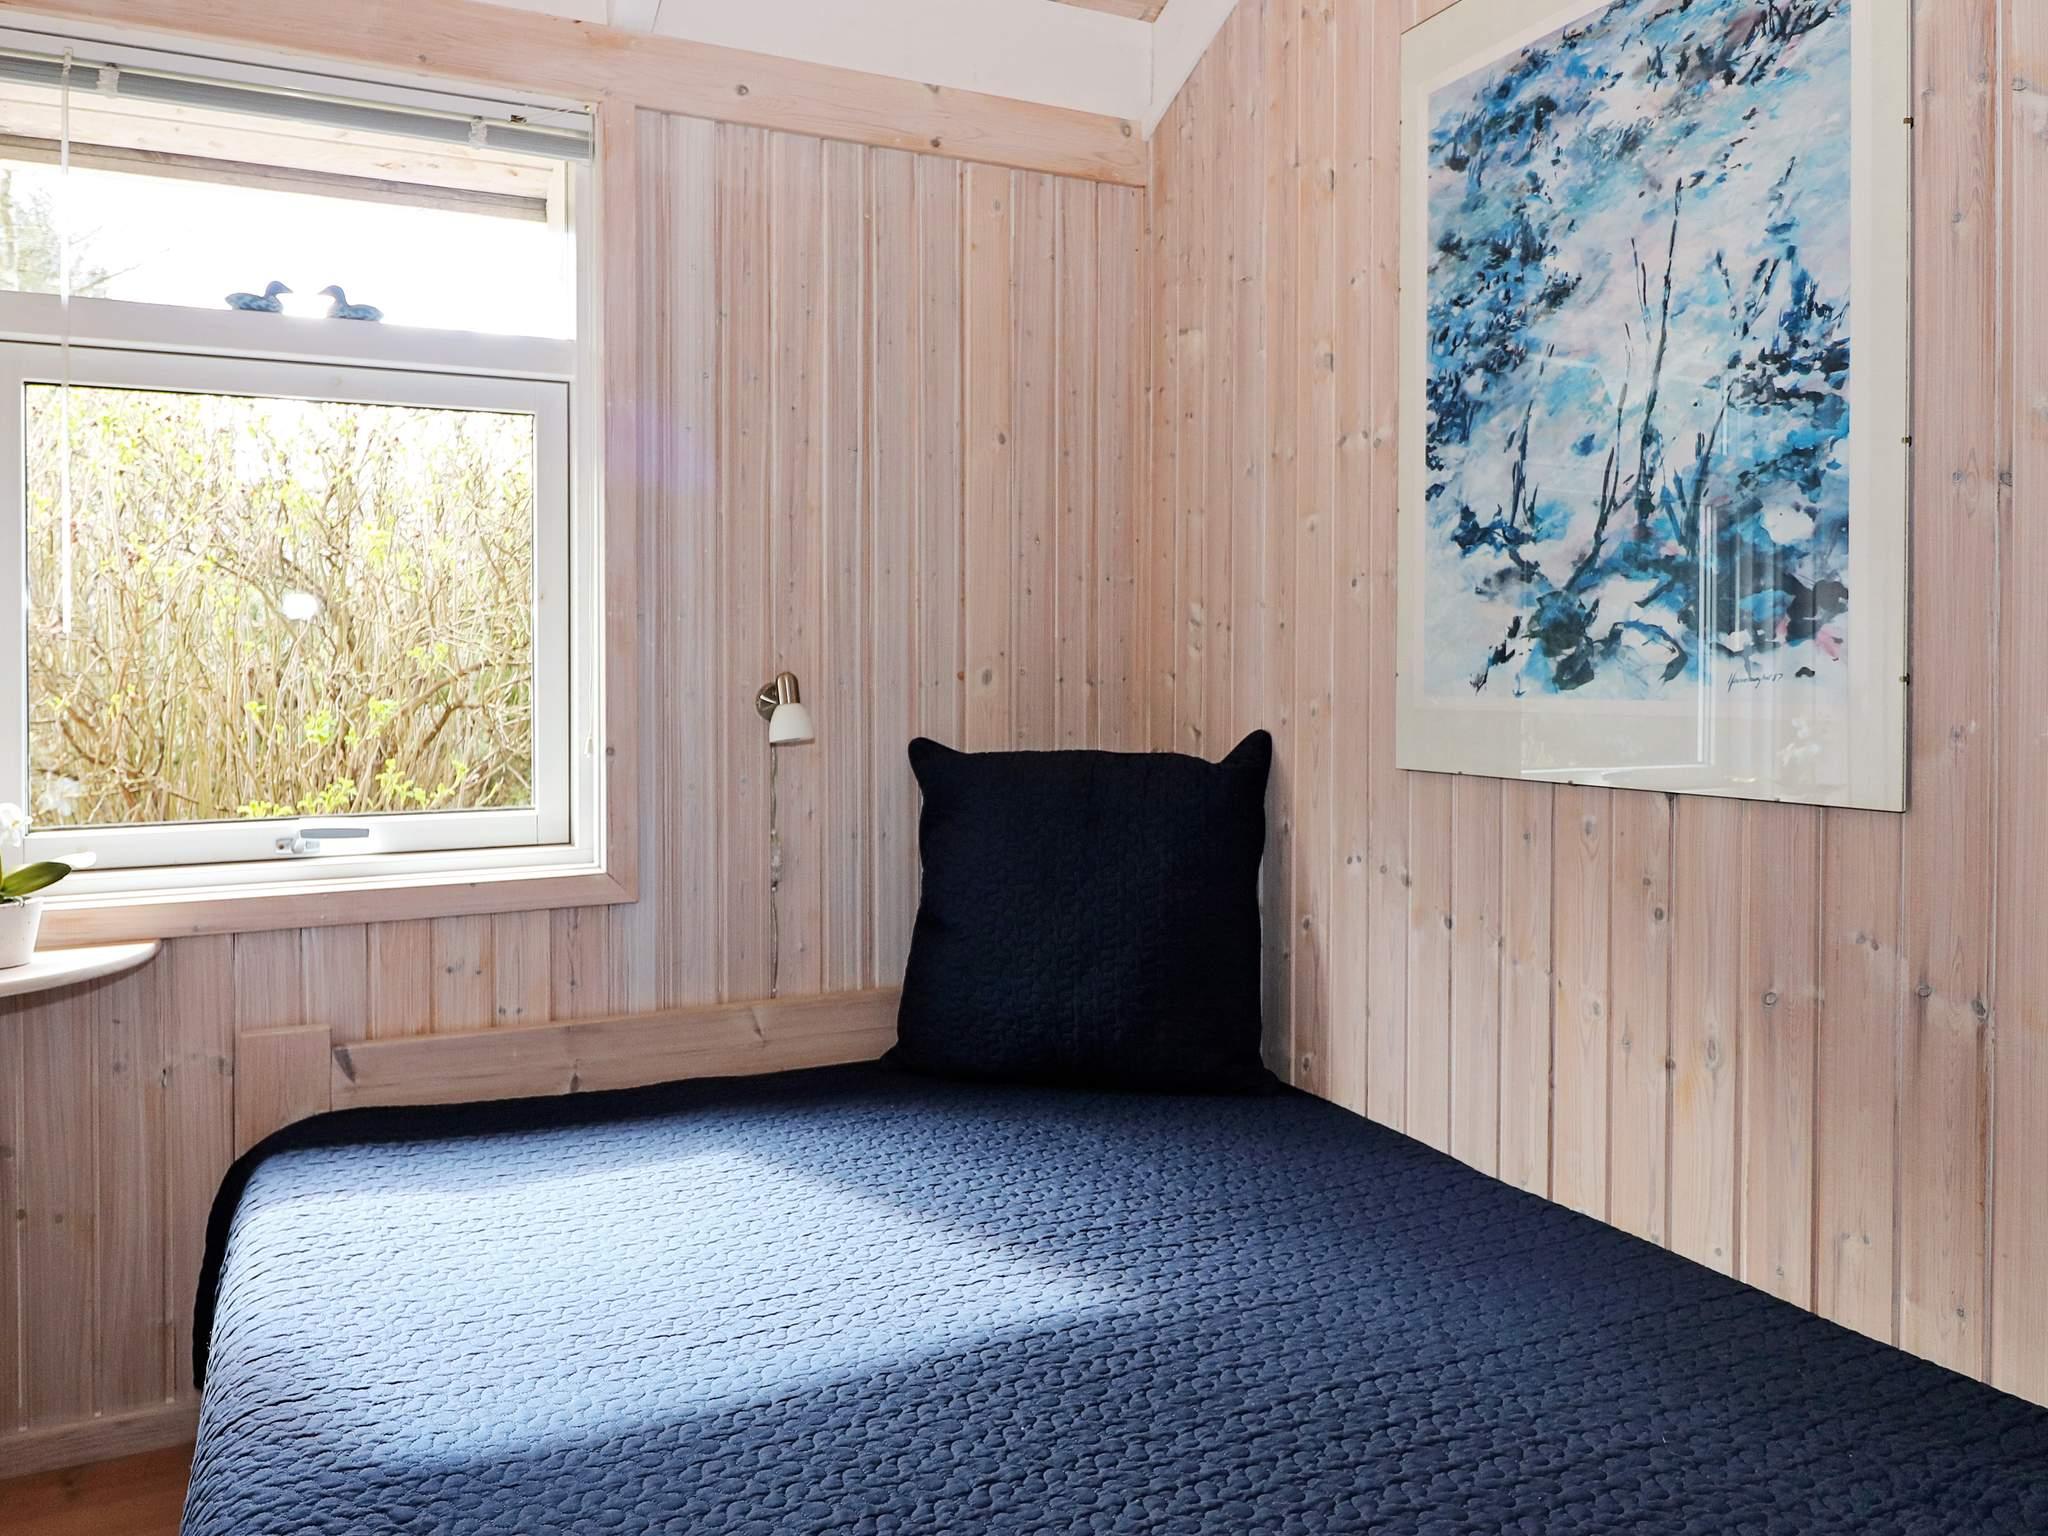 Ferienhaus Øster Hurup (83254), Øster Hurup, , Ostjütland, Dänemark, Bild 8